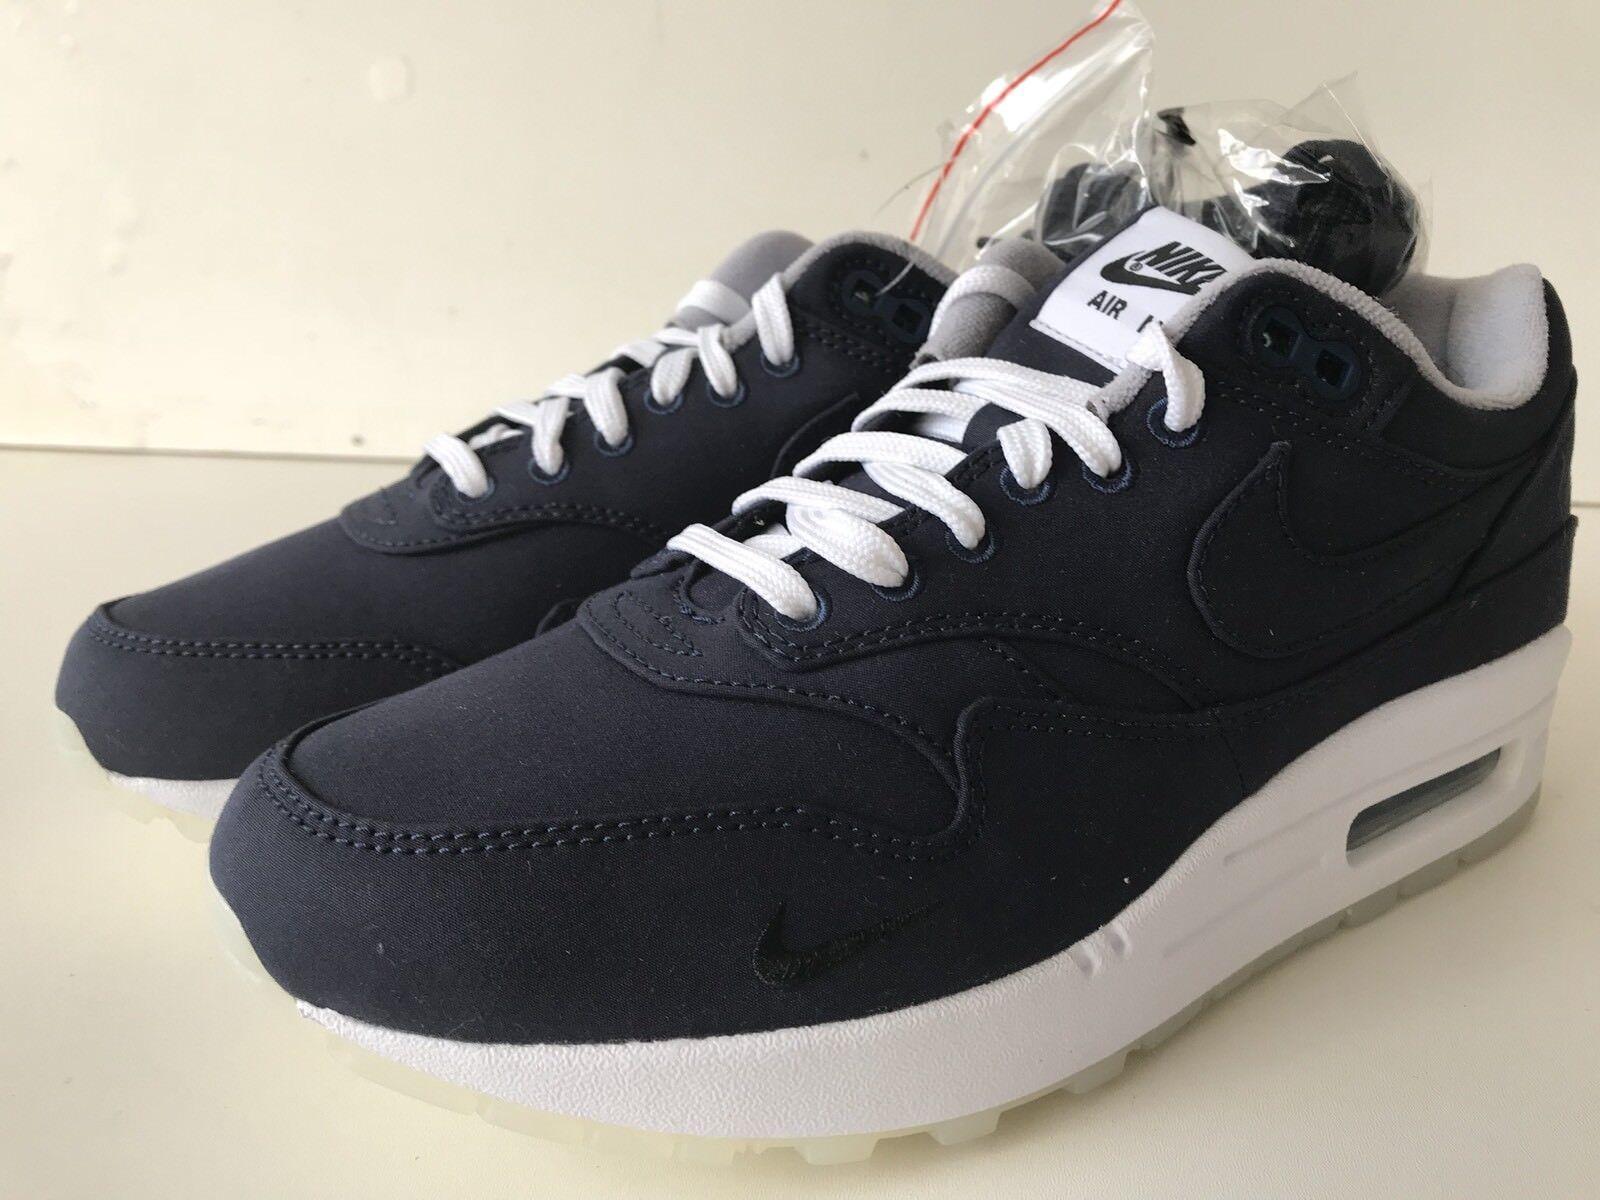 Nike air max 1 / dsm dover coraggioso blu ah8051 400 dimensioni 6 uomini o donne nwb